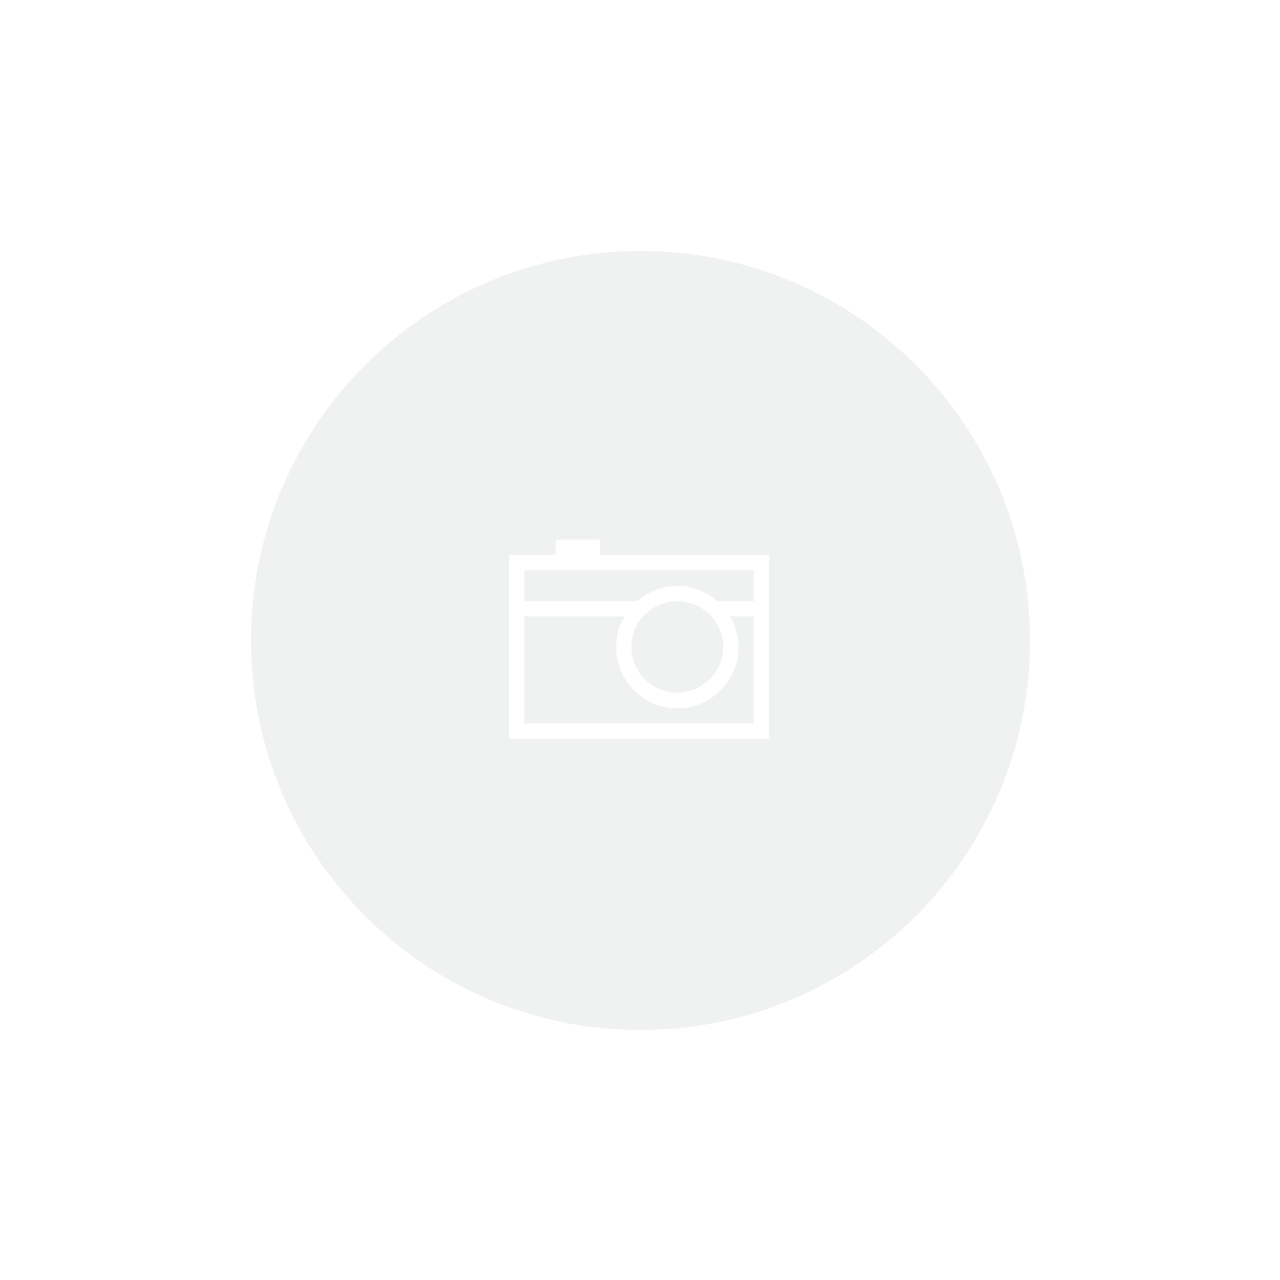 Papel Artesanal Indiano - Ref. 52